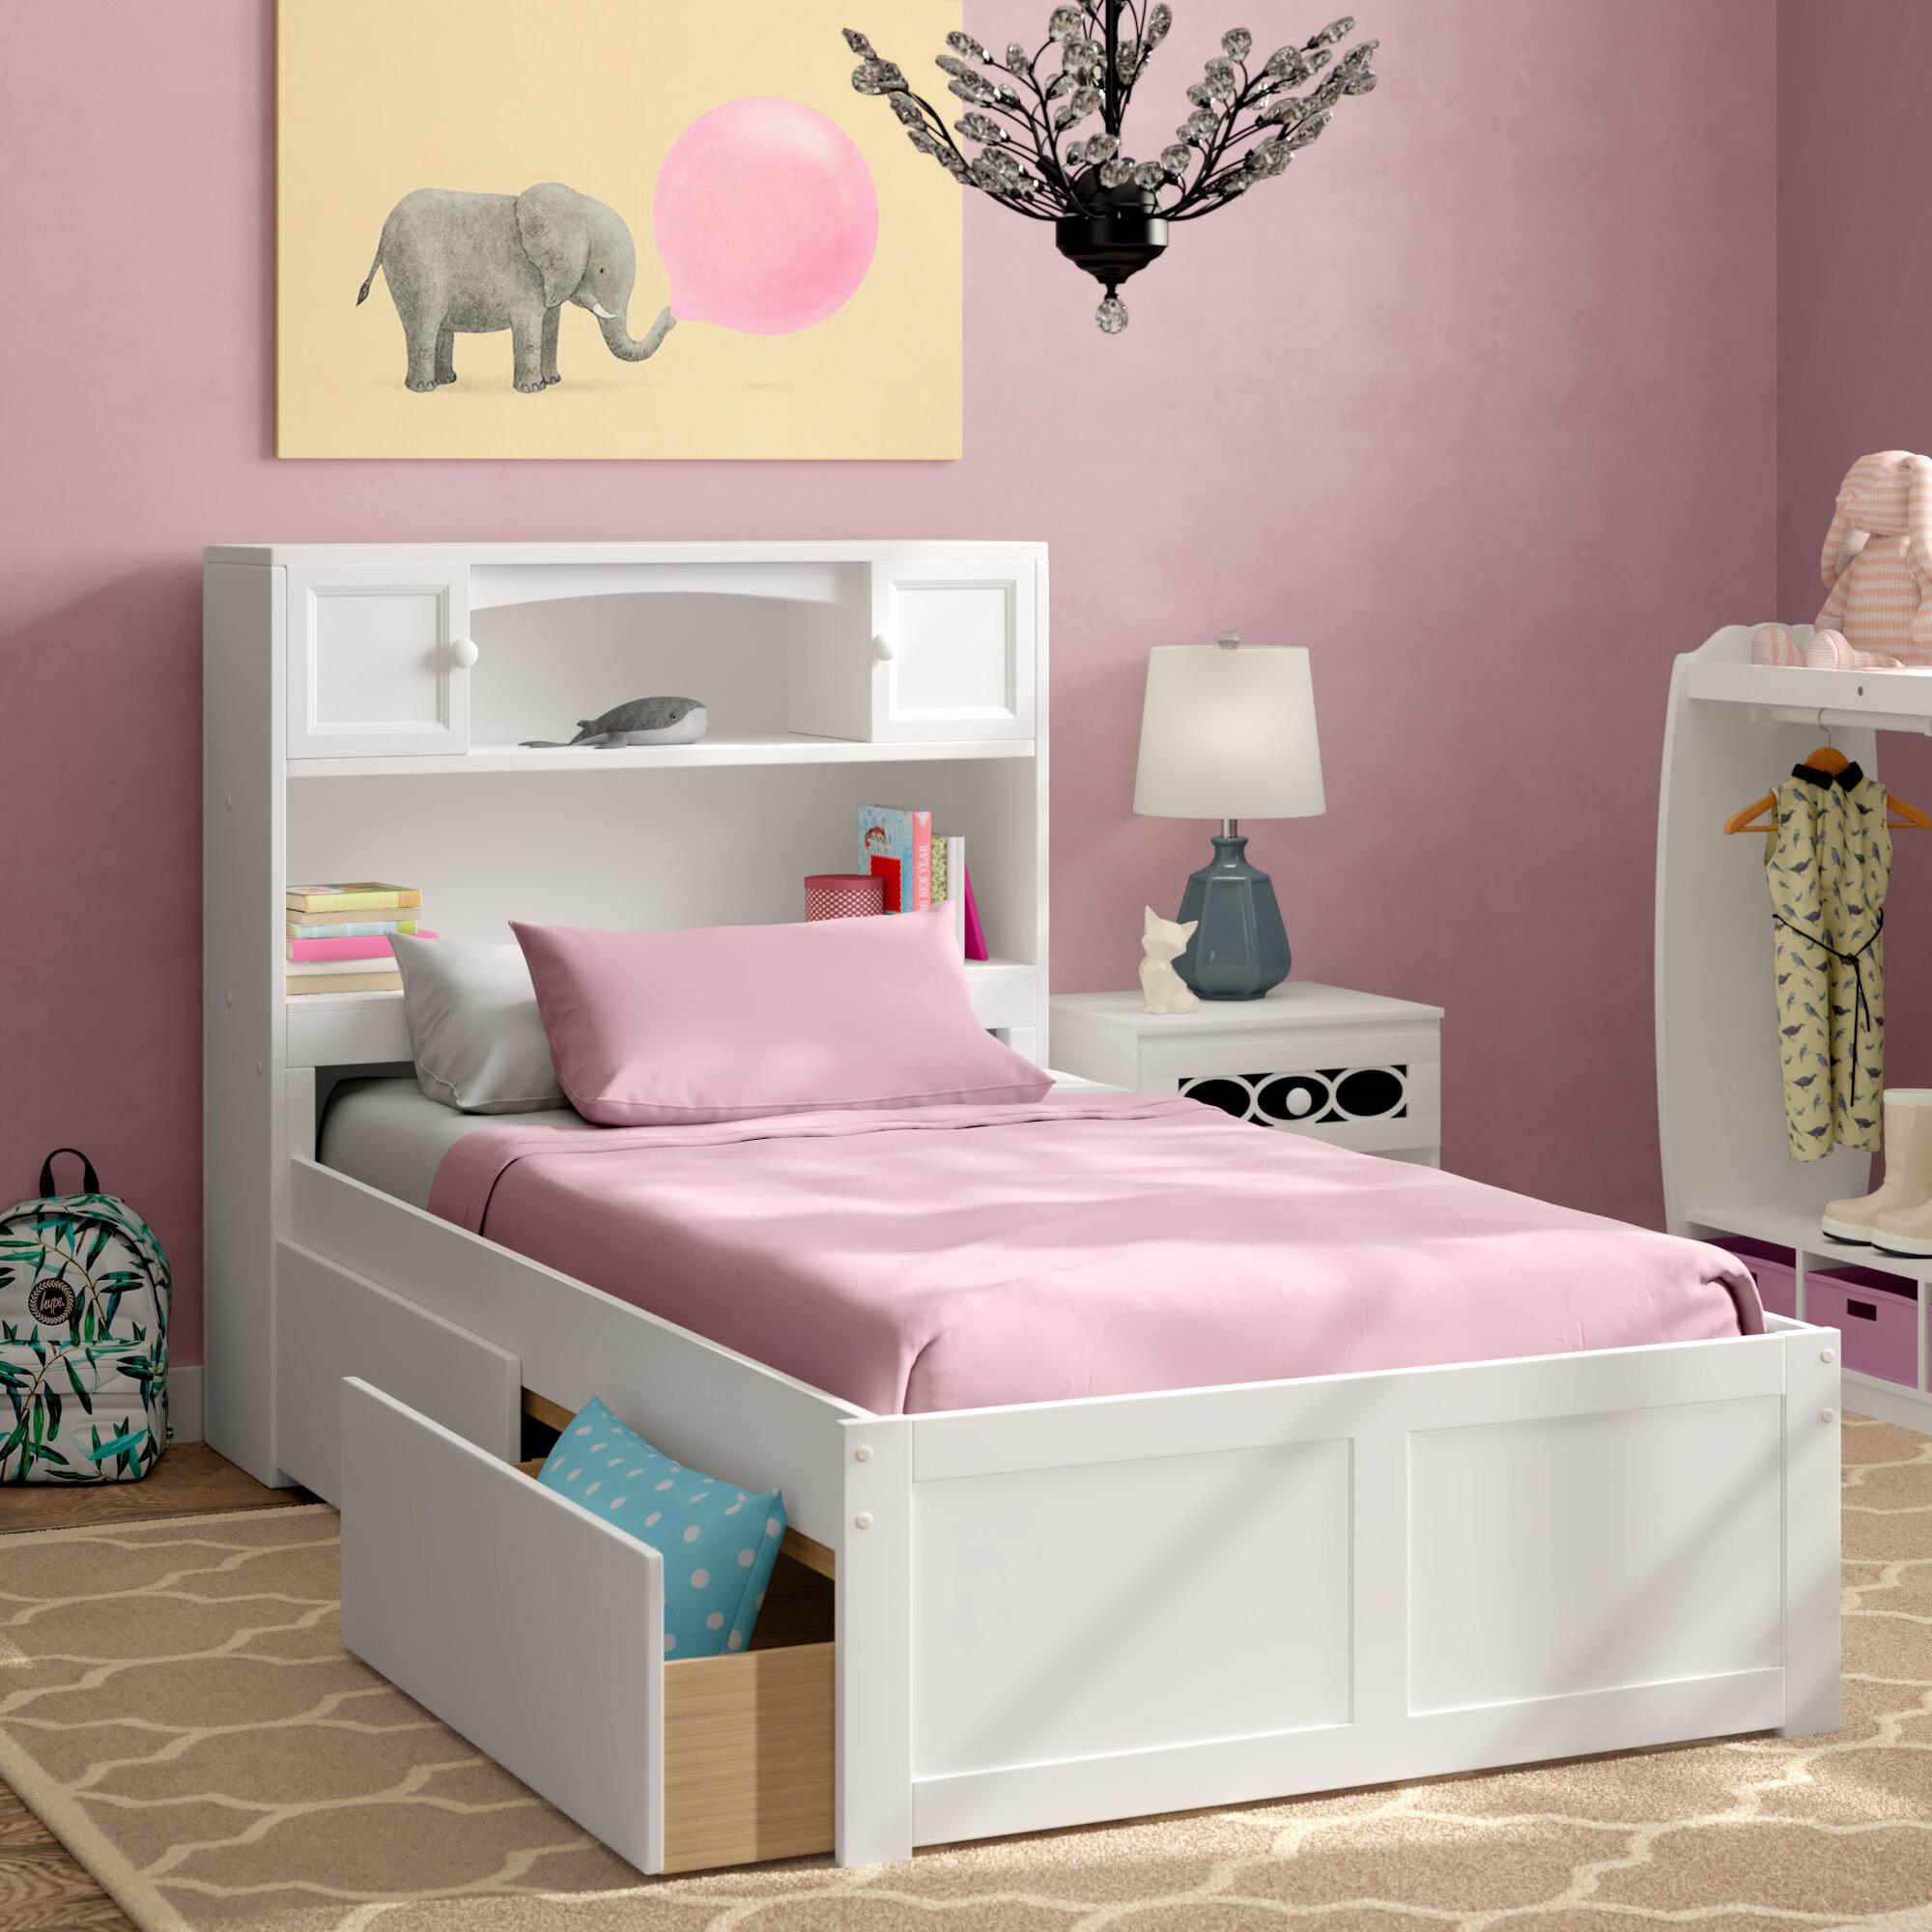 Girls Twin Kids Beds Free Shipping Over 35 Wayfair